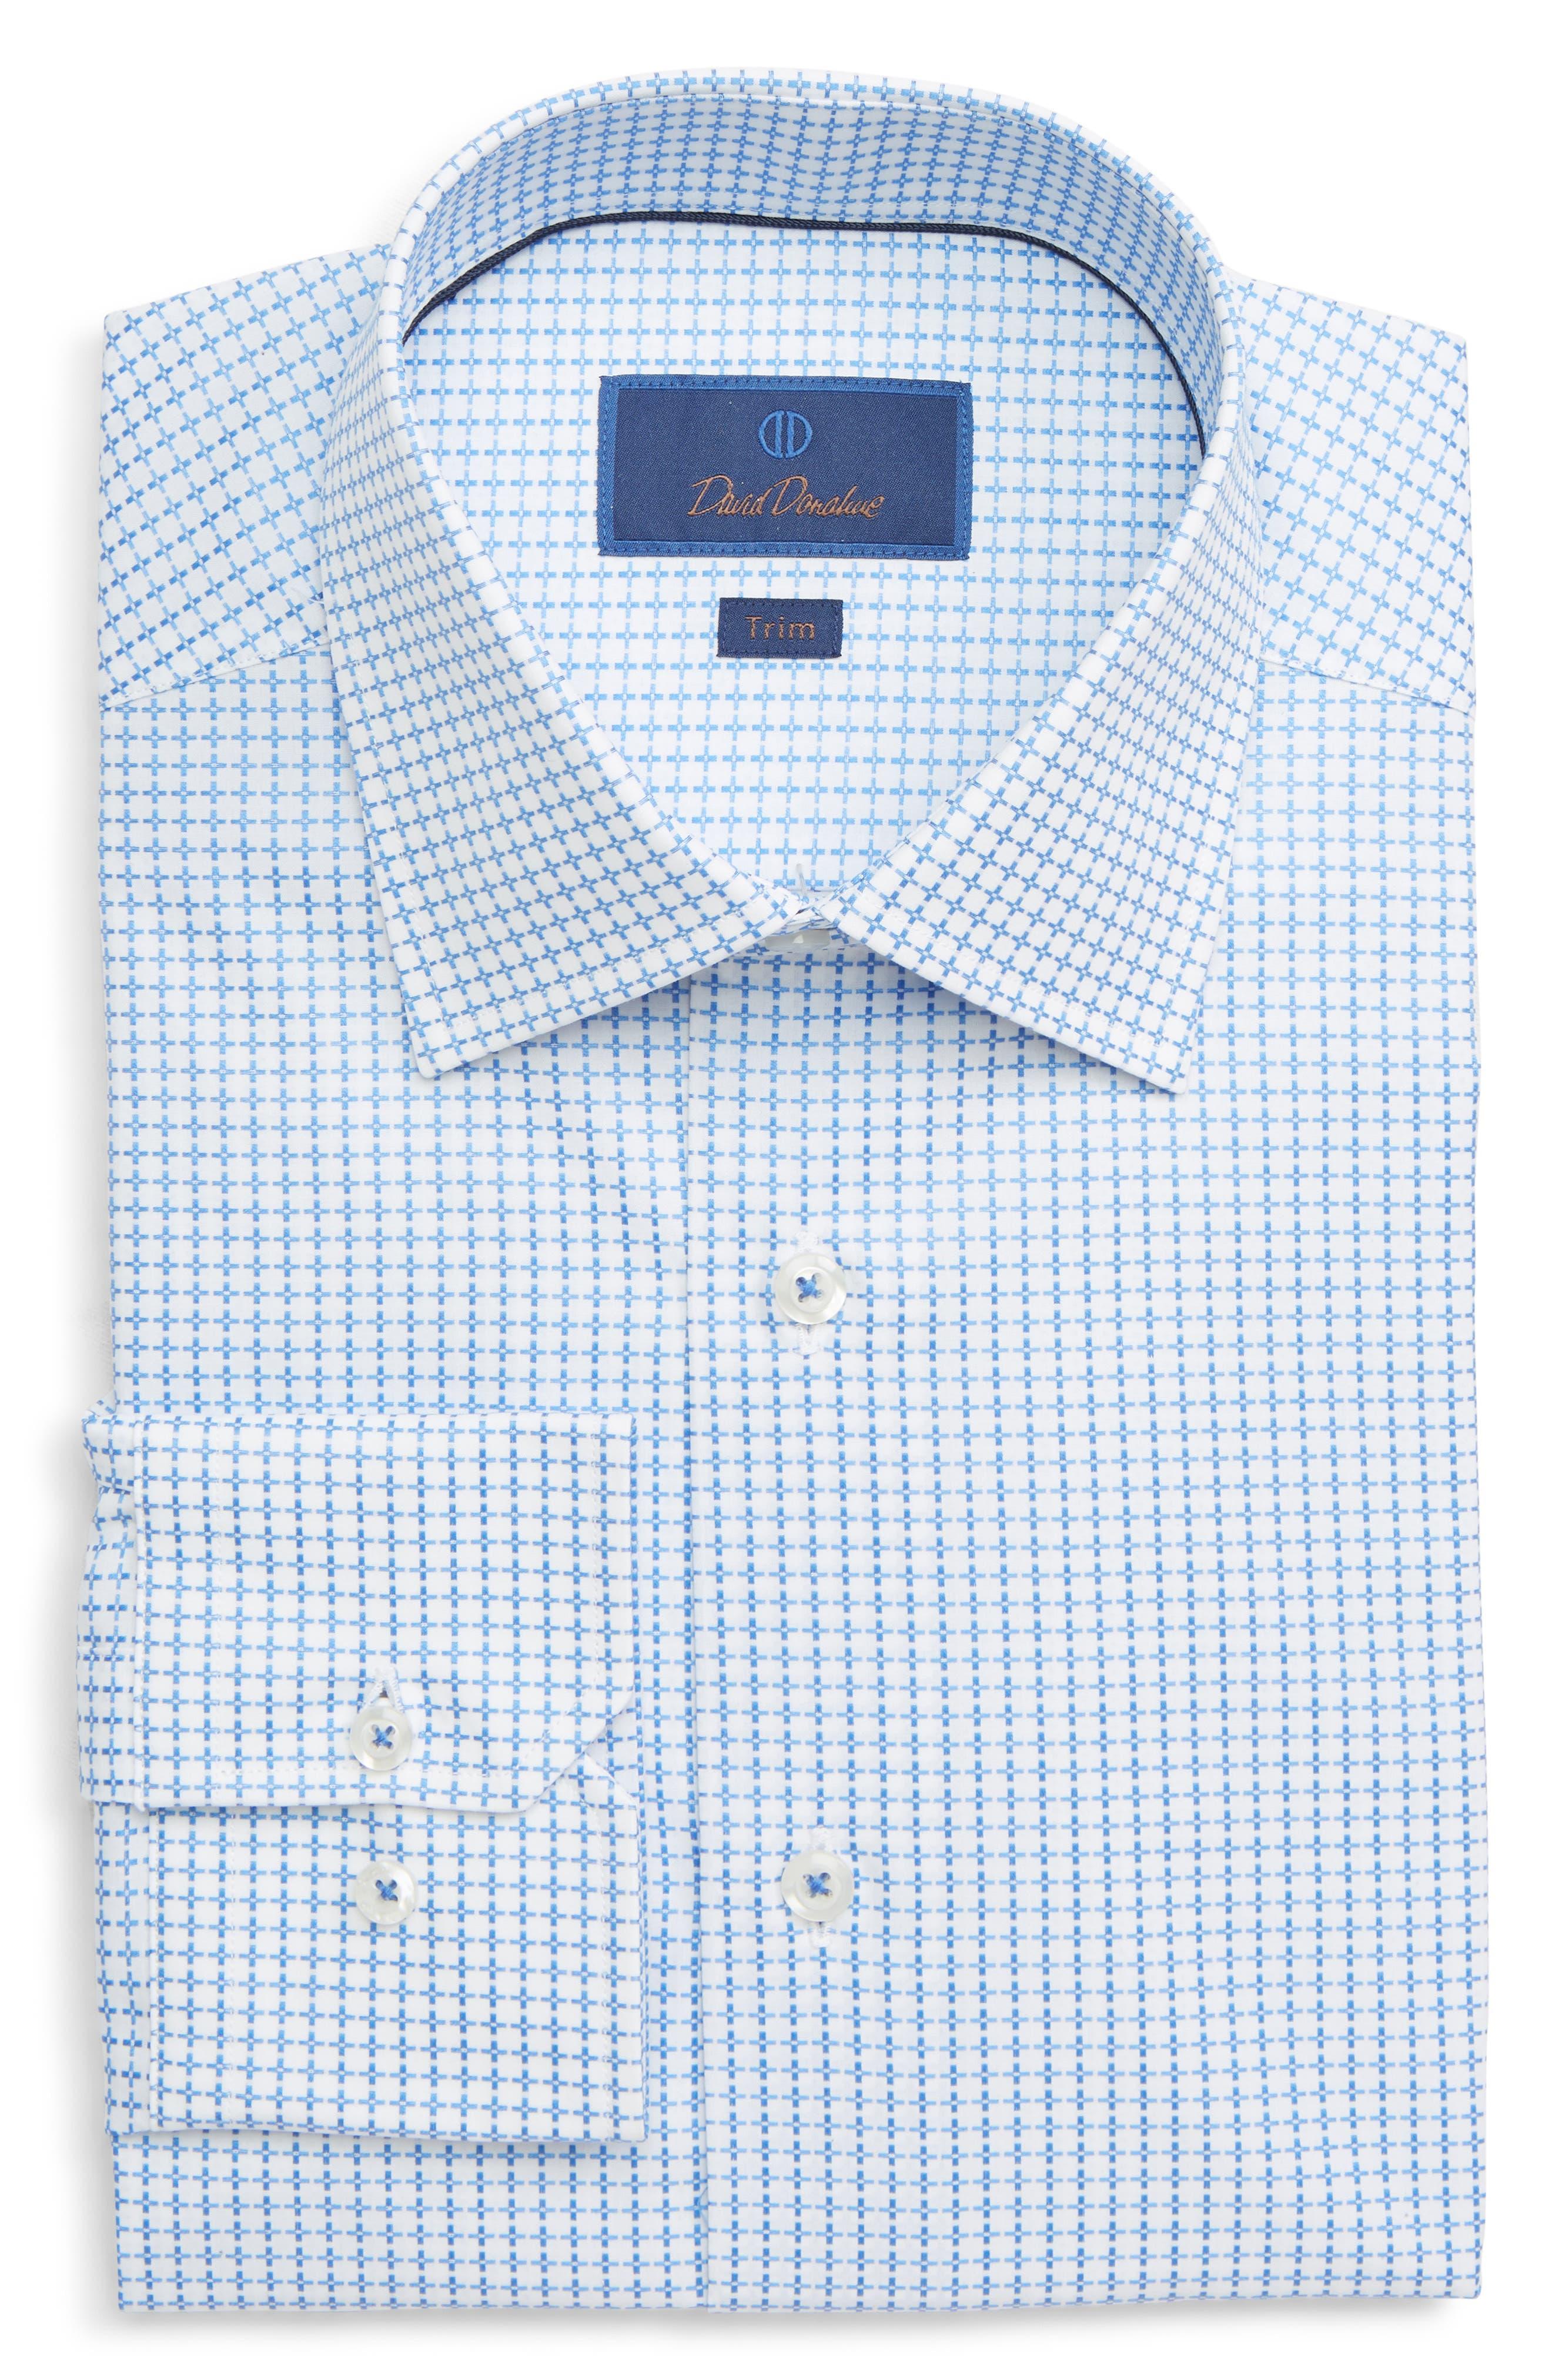 DAVID DONAHUE, Trim Fit Geometric Dress Shirt, Main thumbnail 1, color, BLUE